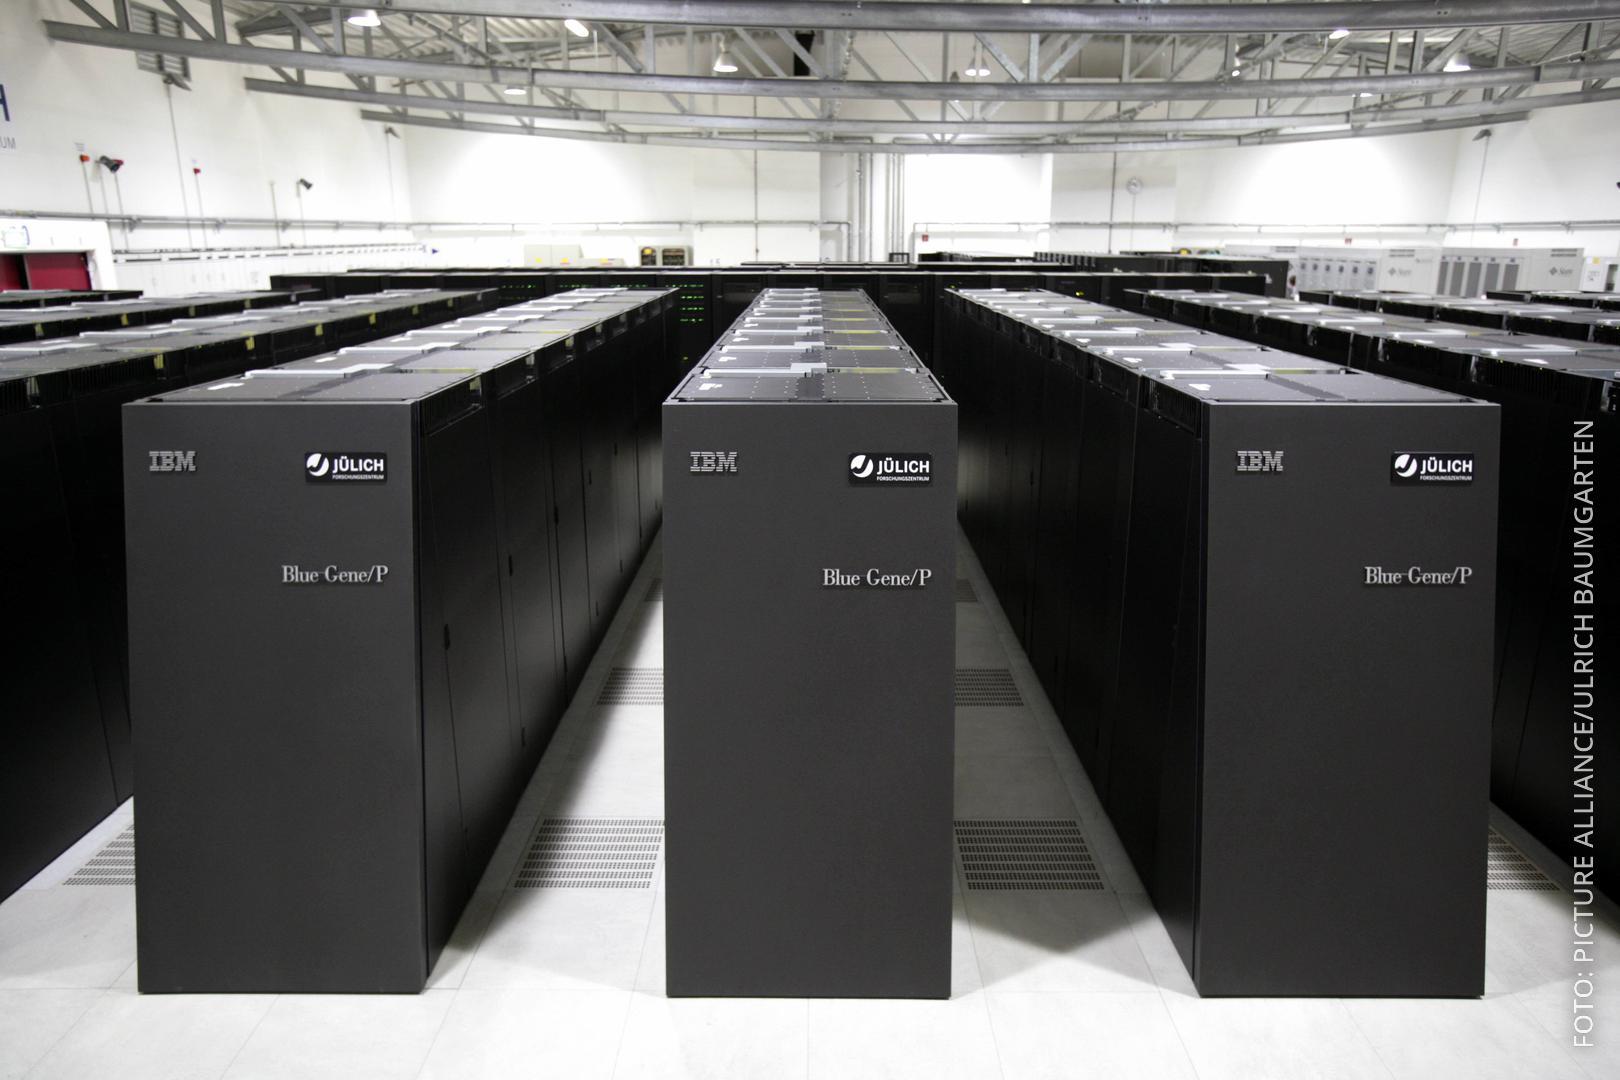 Viele PCs nebeneinander